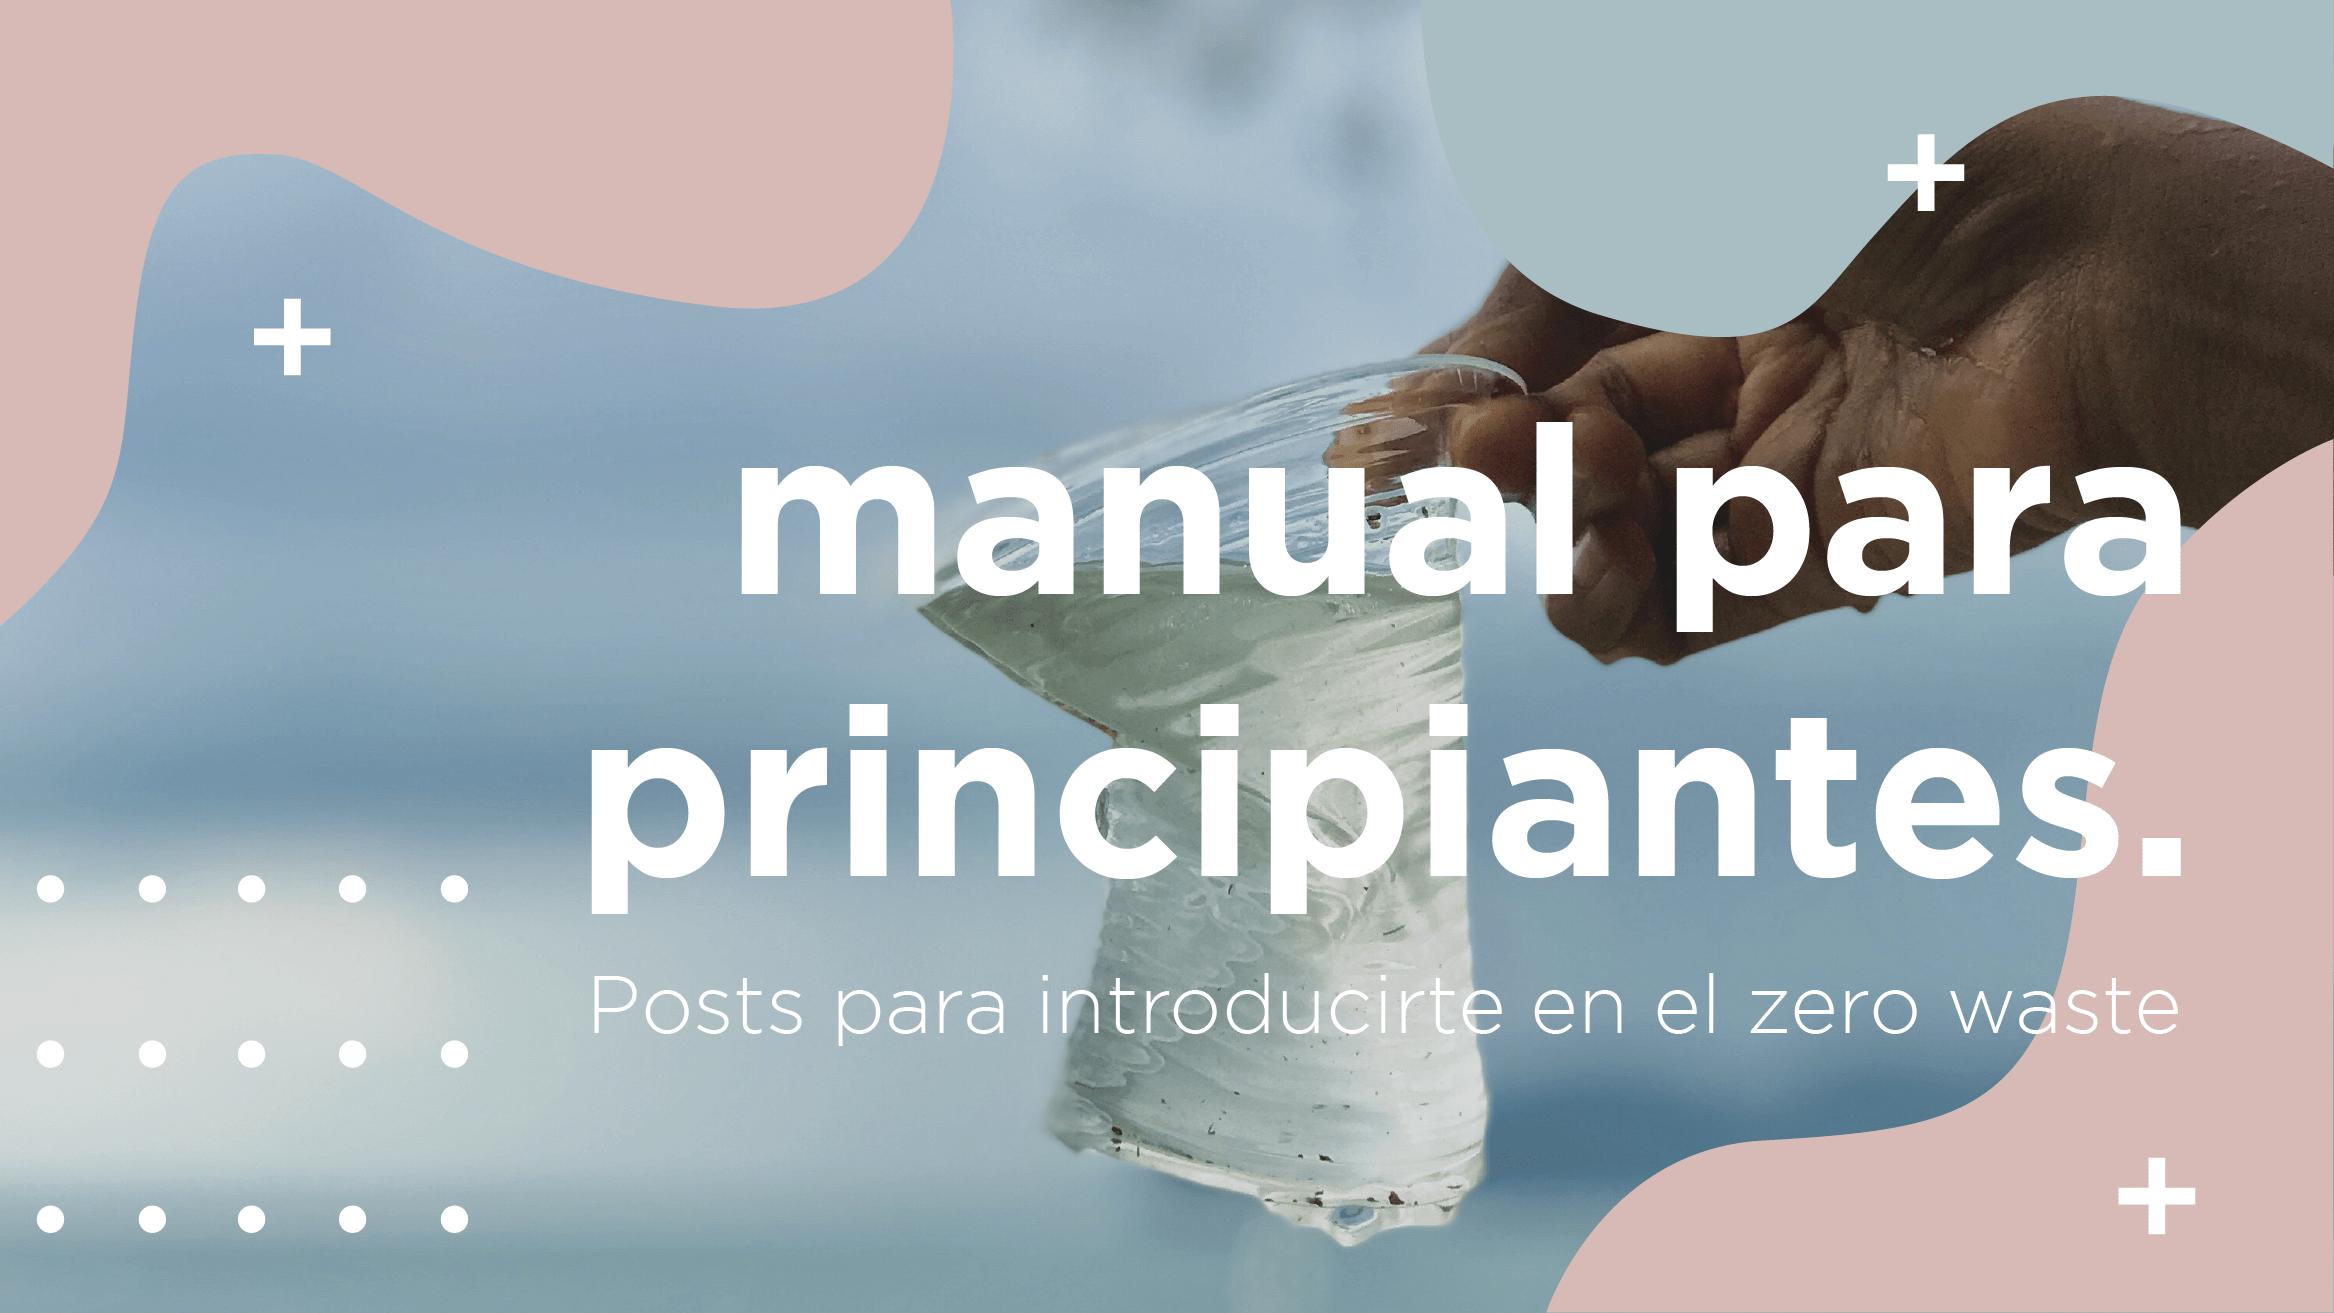 Manual para principiantes